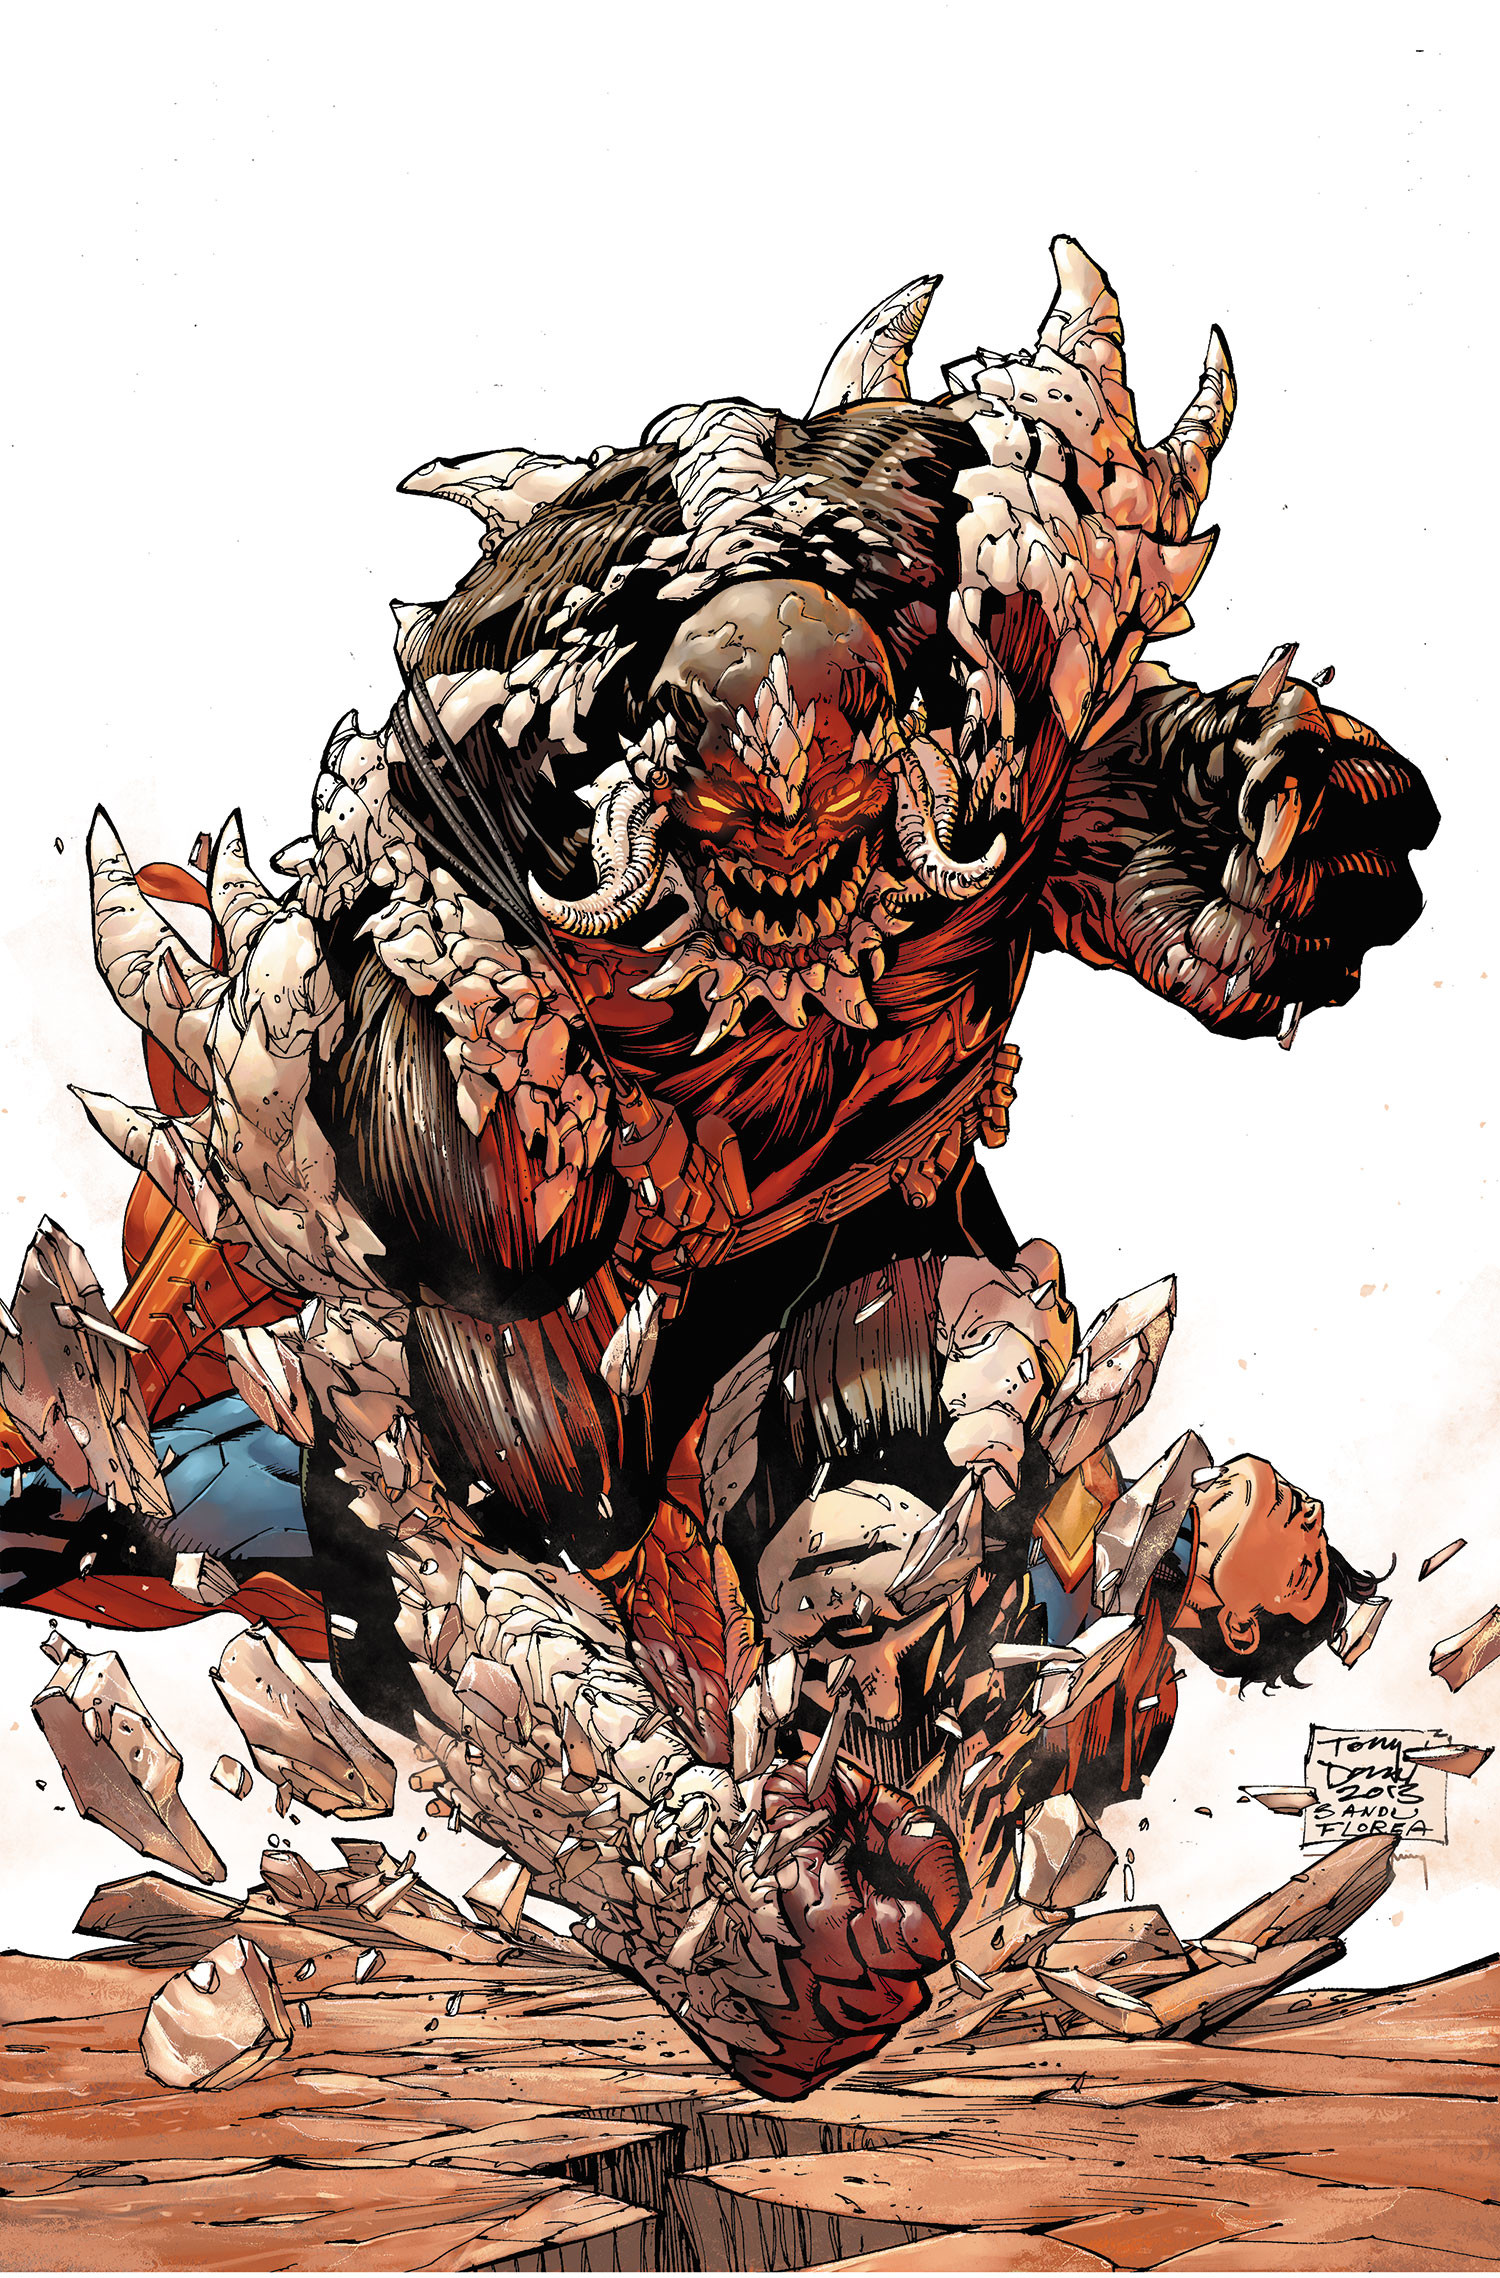 Res: 1500x2278, ... Doomsday new 52 wallpaper Image Gallery New 52 Darkseid 2019 03 12